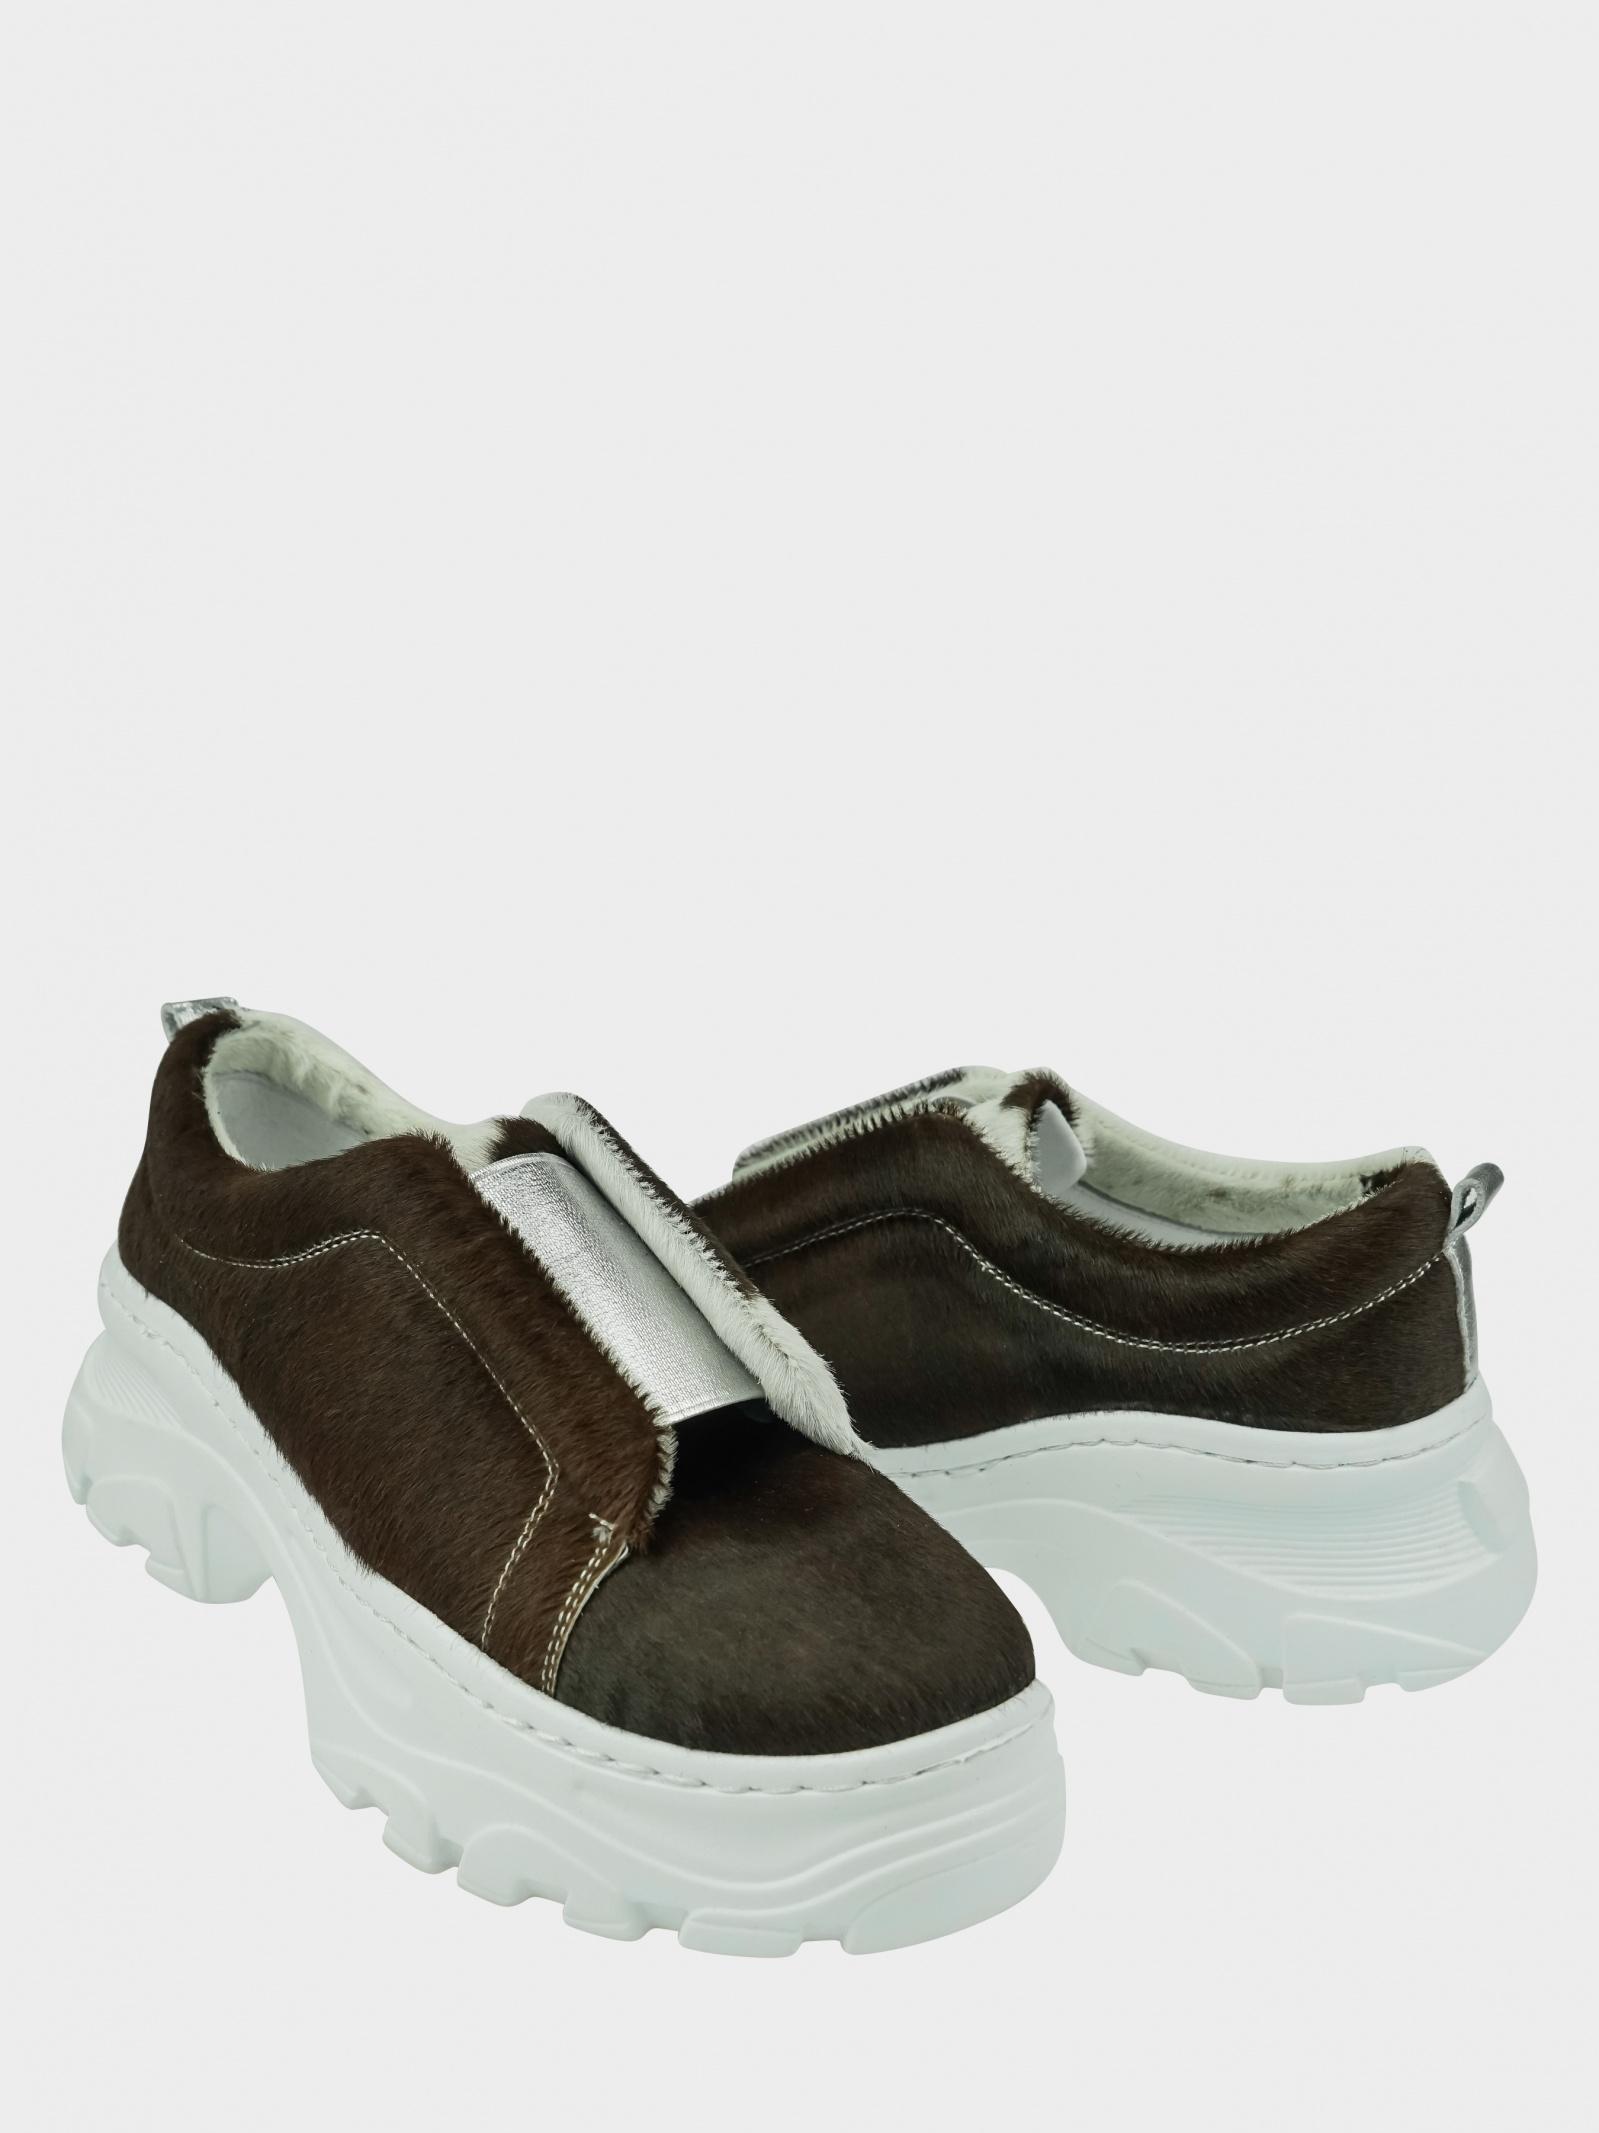 Кроссовки женские Mad Cow Elastic Sneakers 79-637-170-107 размерная сетка обуви, 2017